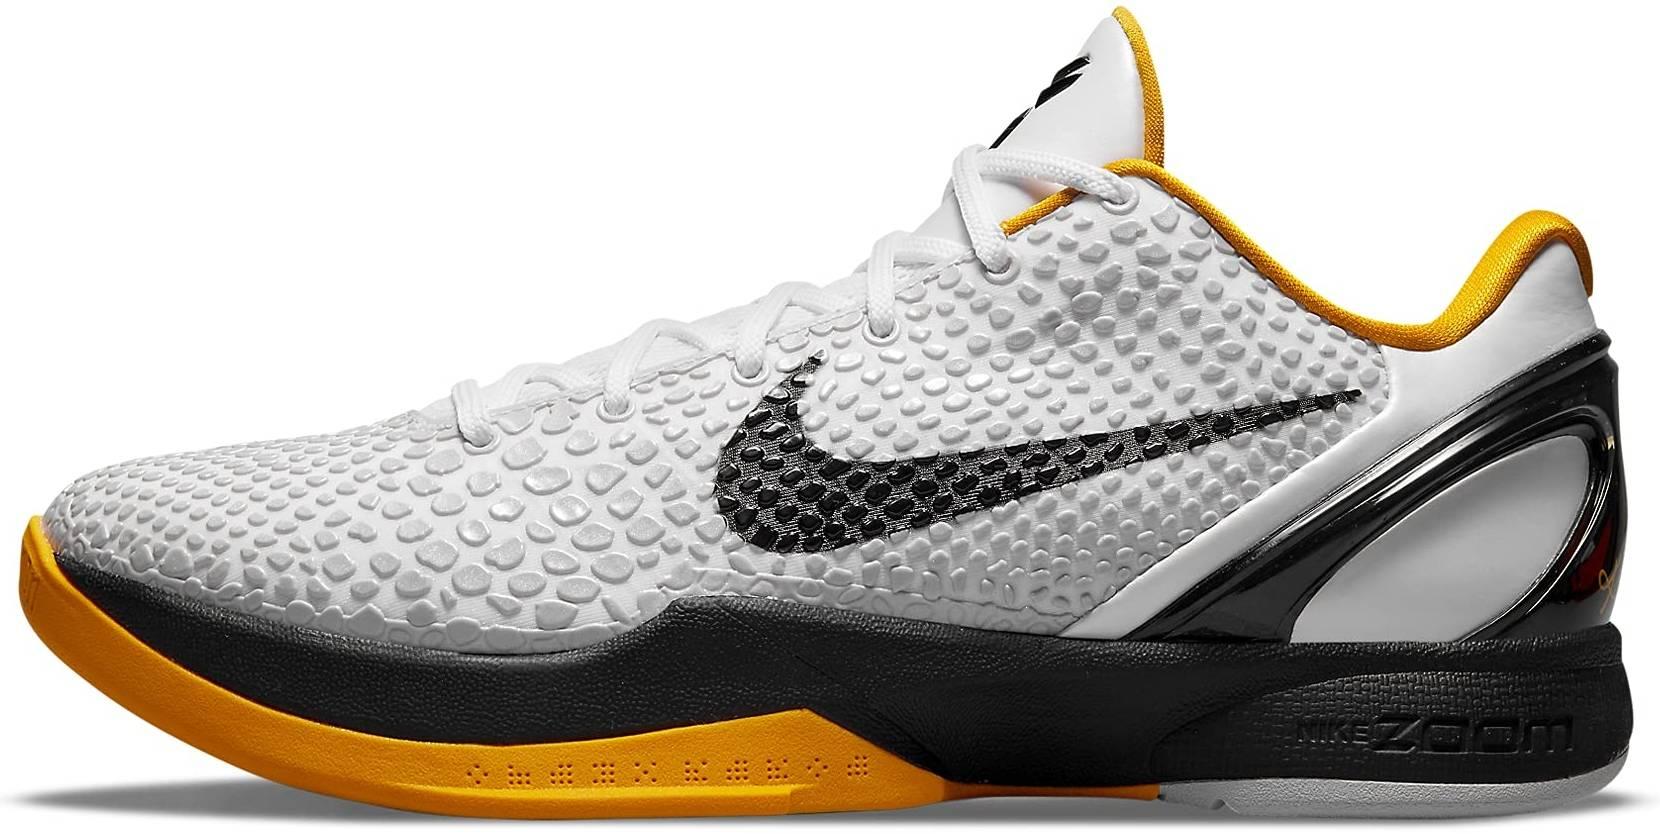 Nike Kobe 6 Protro - Deals, Facts, Reviews (2021) | RunRepeat